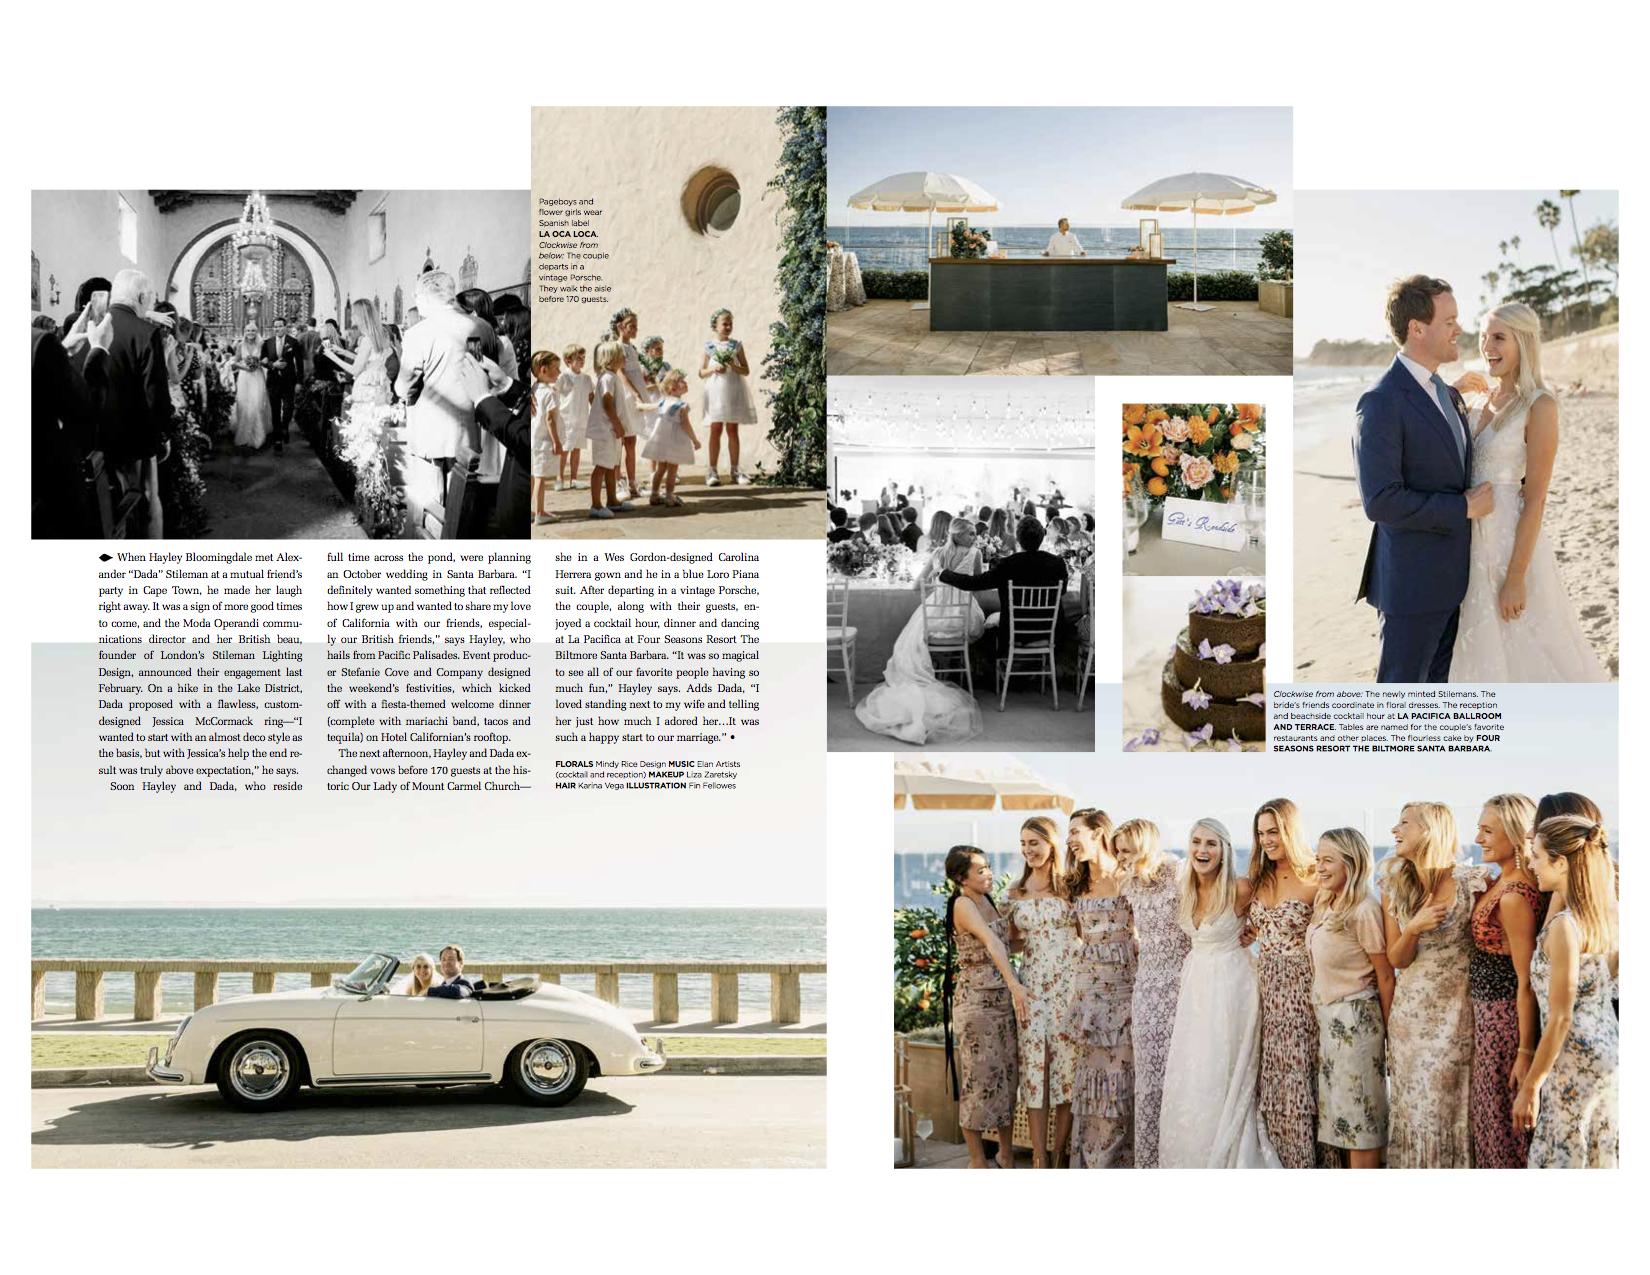 C Weddings_Spring_2019, Coast to Coast (Hayley+Dada)_spread 2.jpg